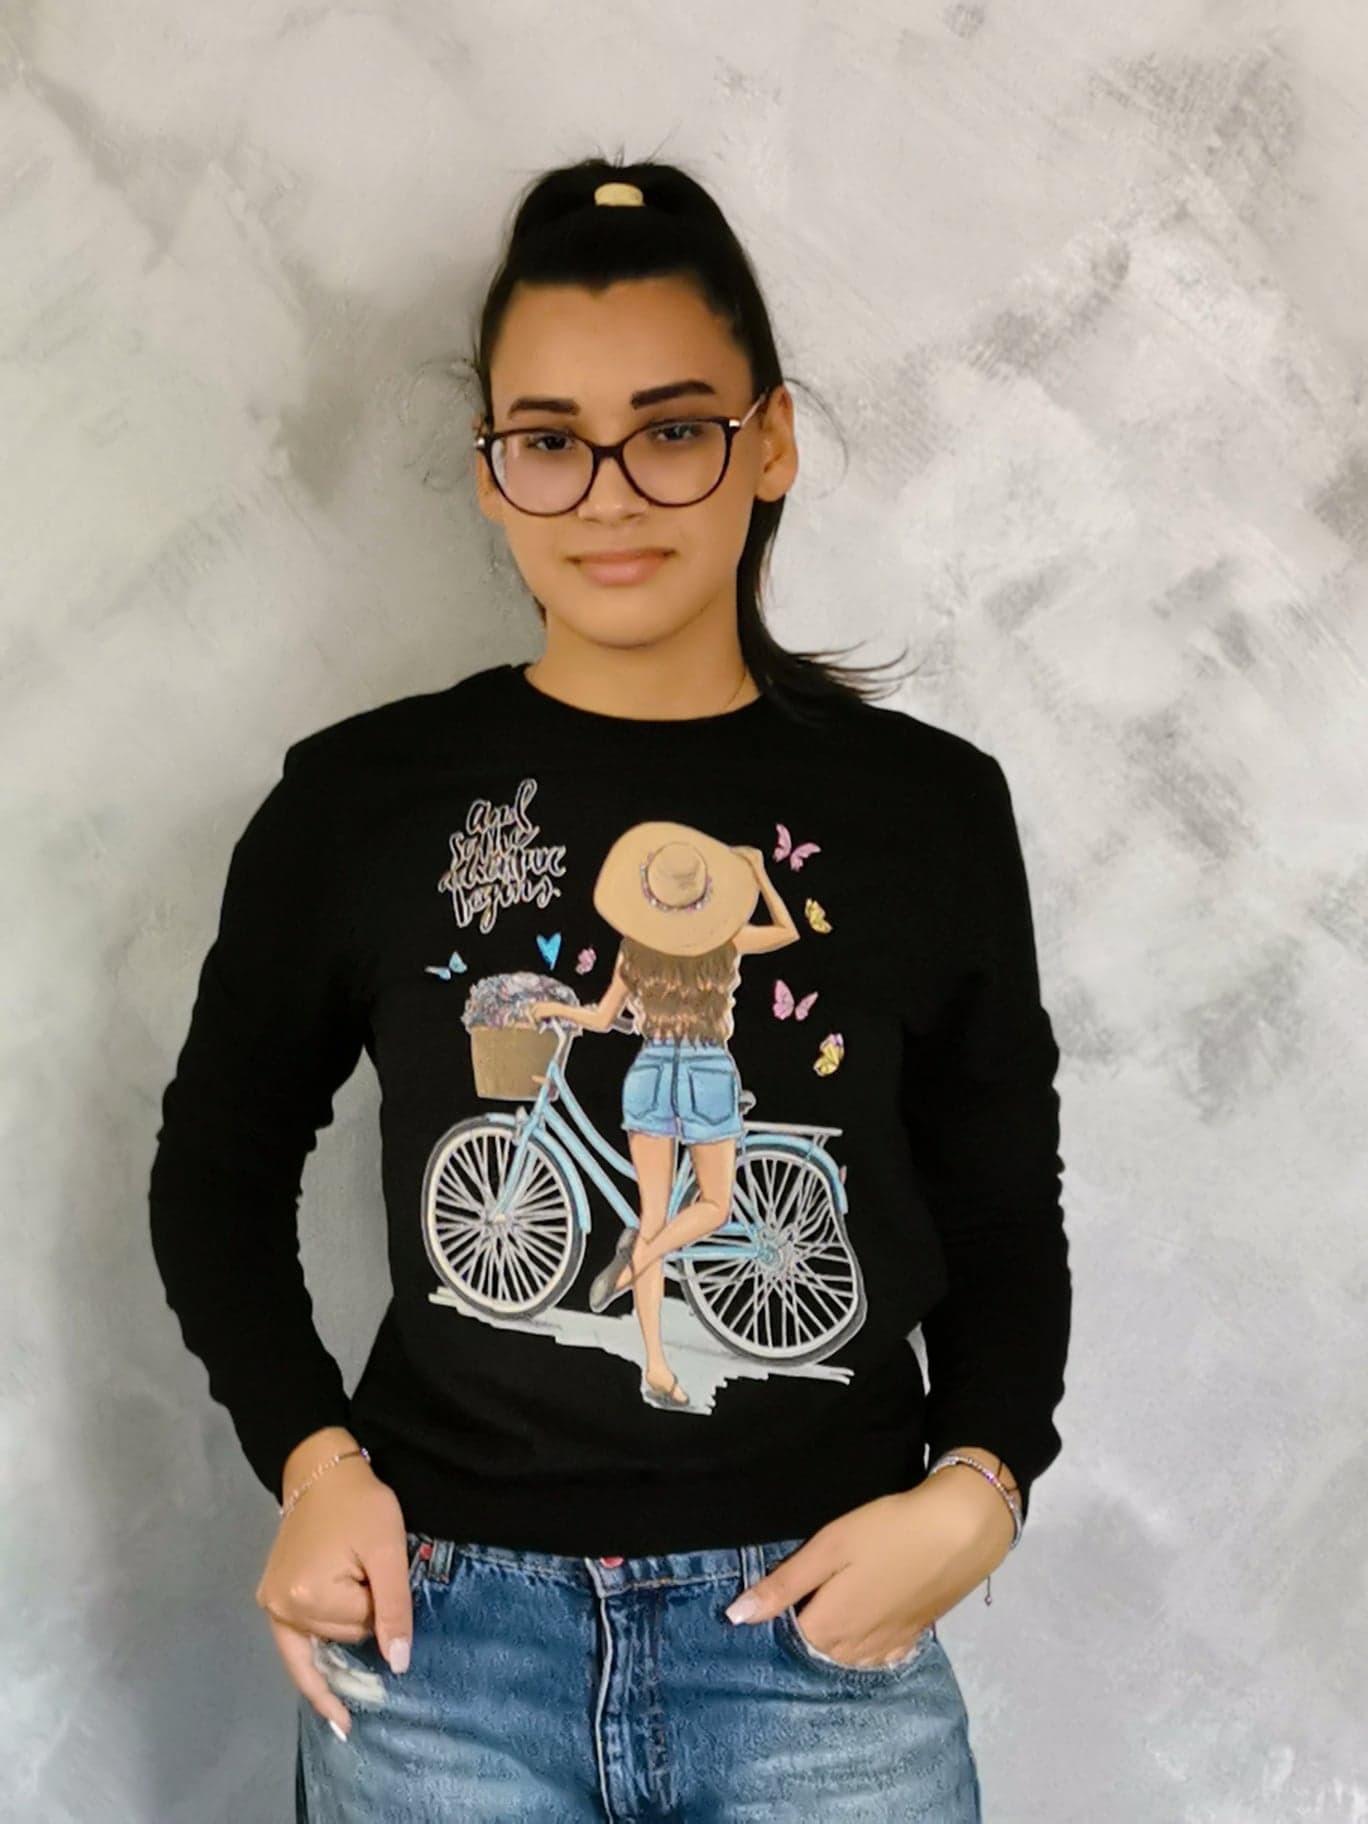 Hanorac imprimat Fata cu bicicleta